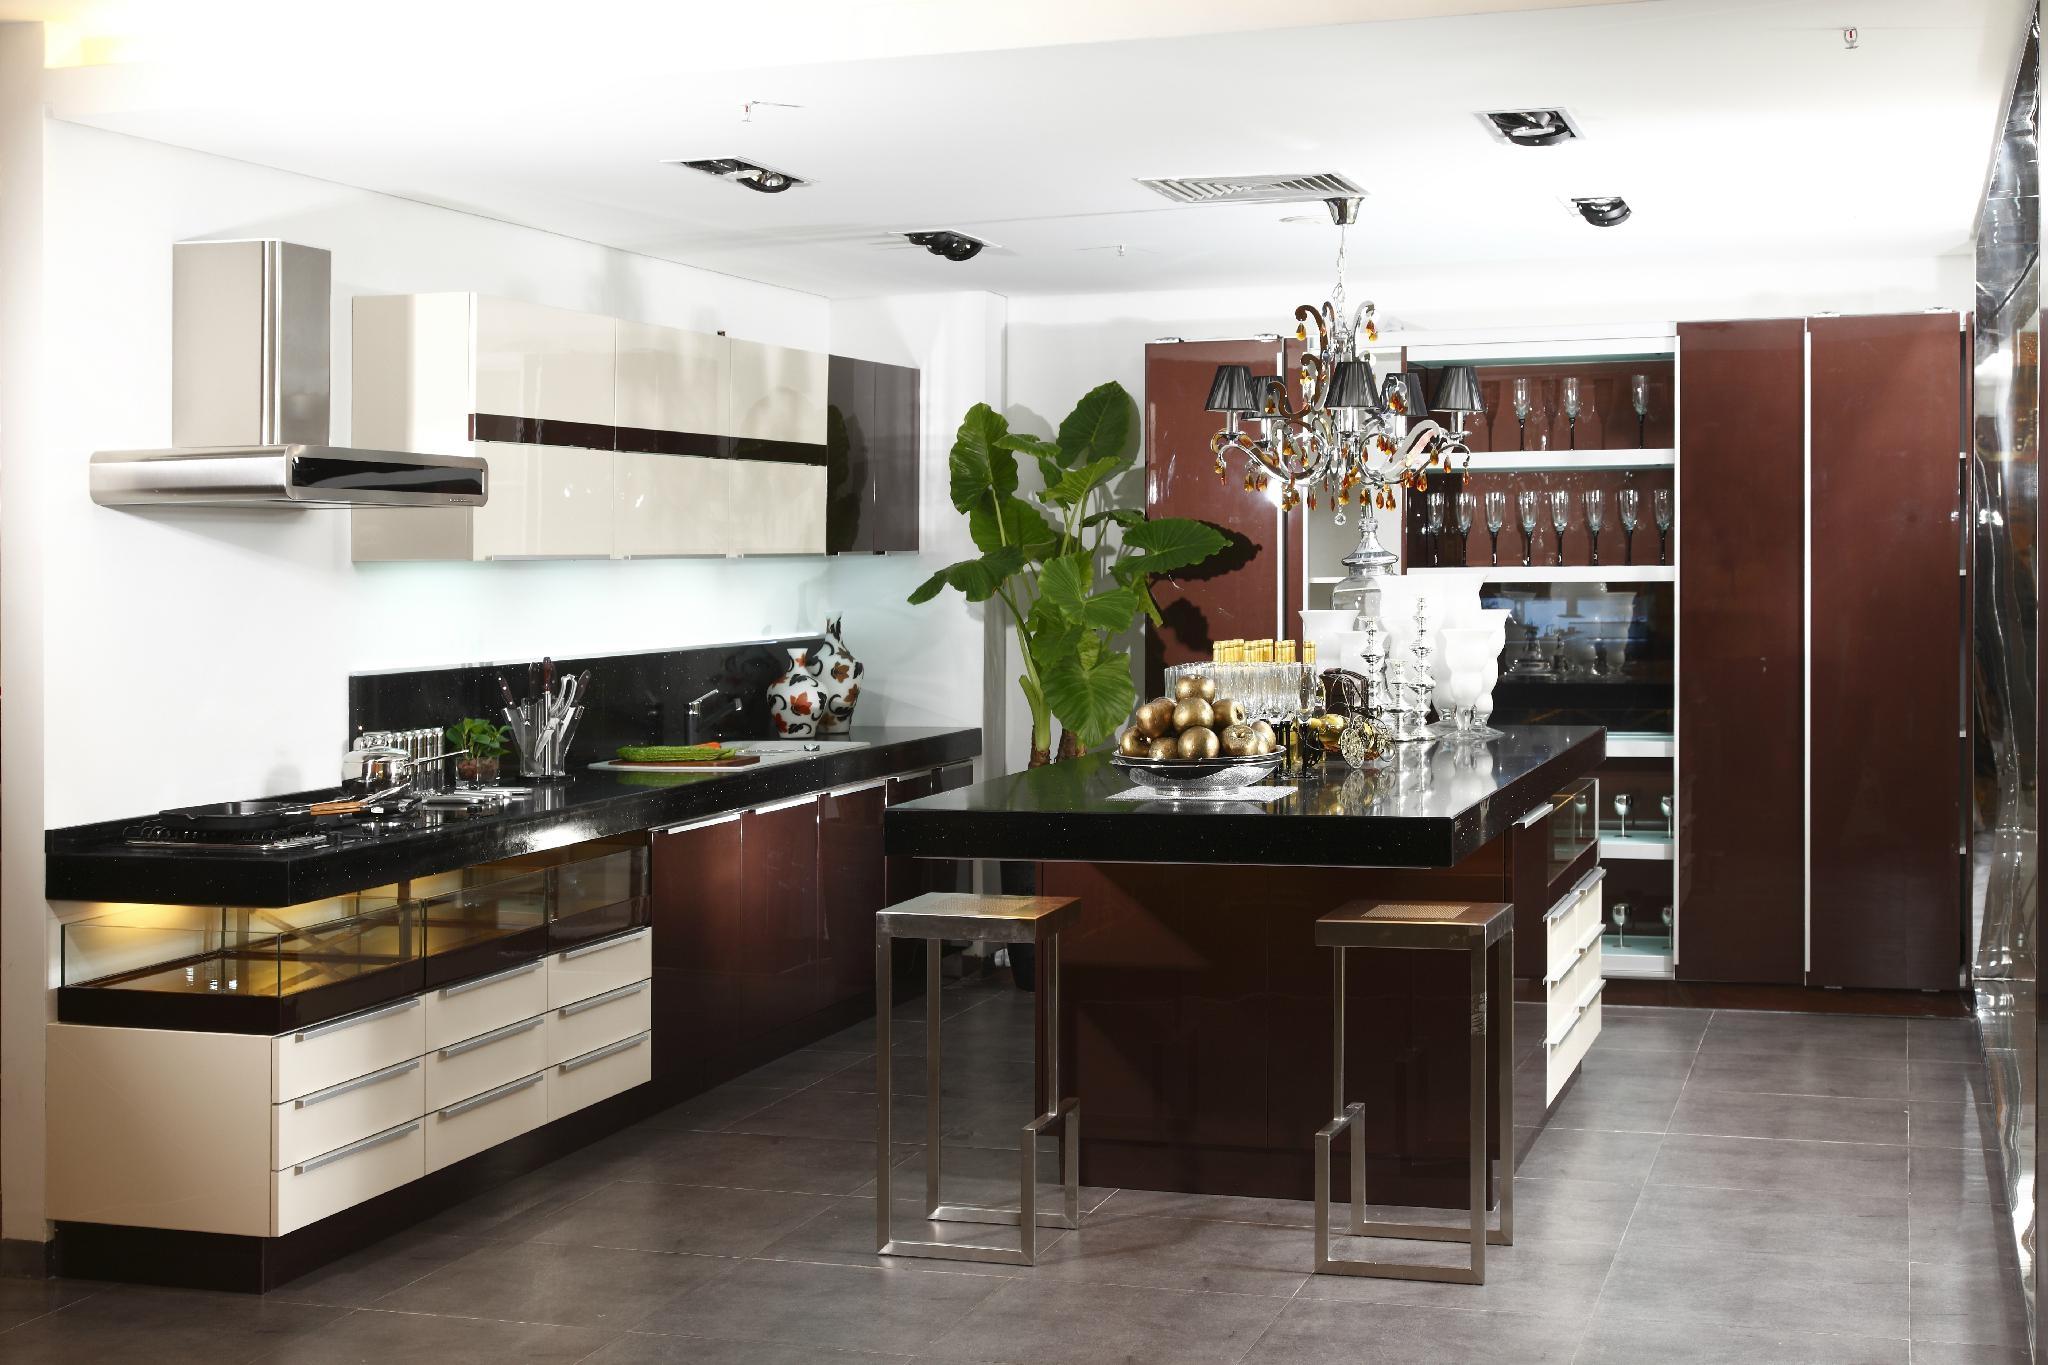 2015 Welbom new kitchen design modern lacquer finish ...